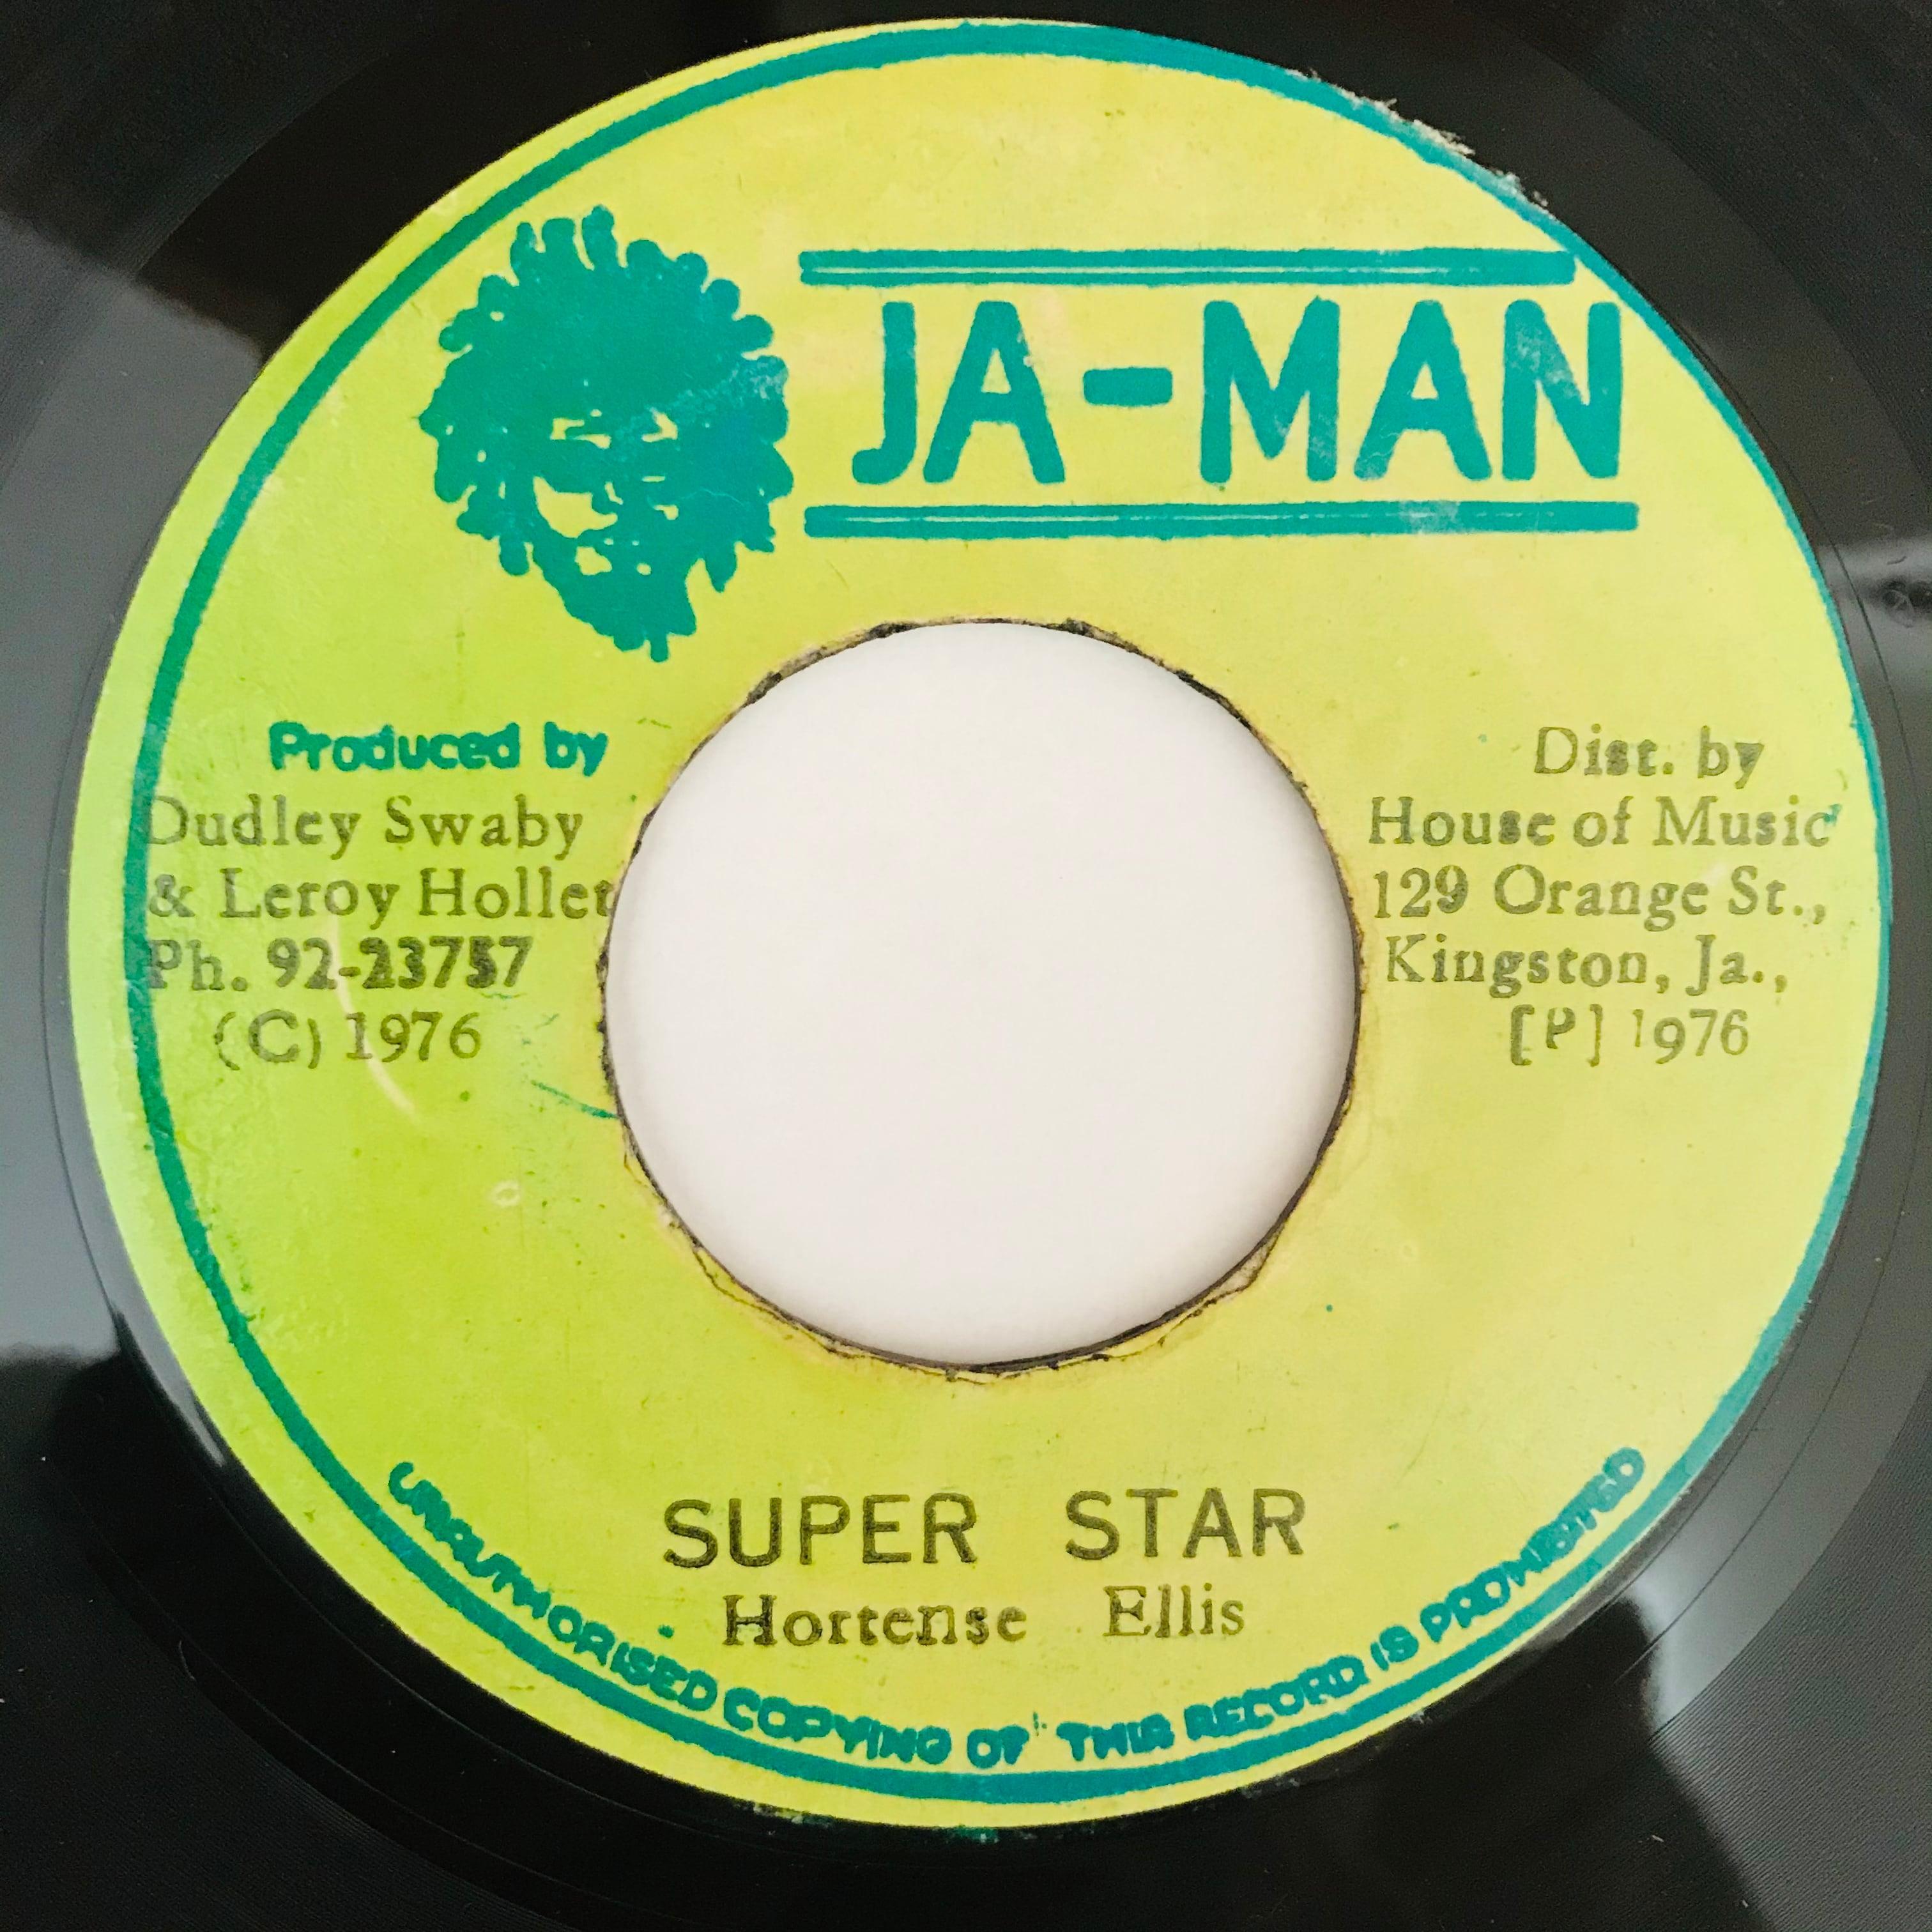 Hortense Ellis - Super Star 【7-10922】